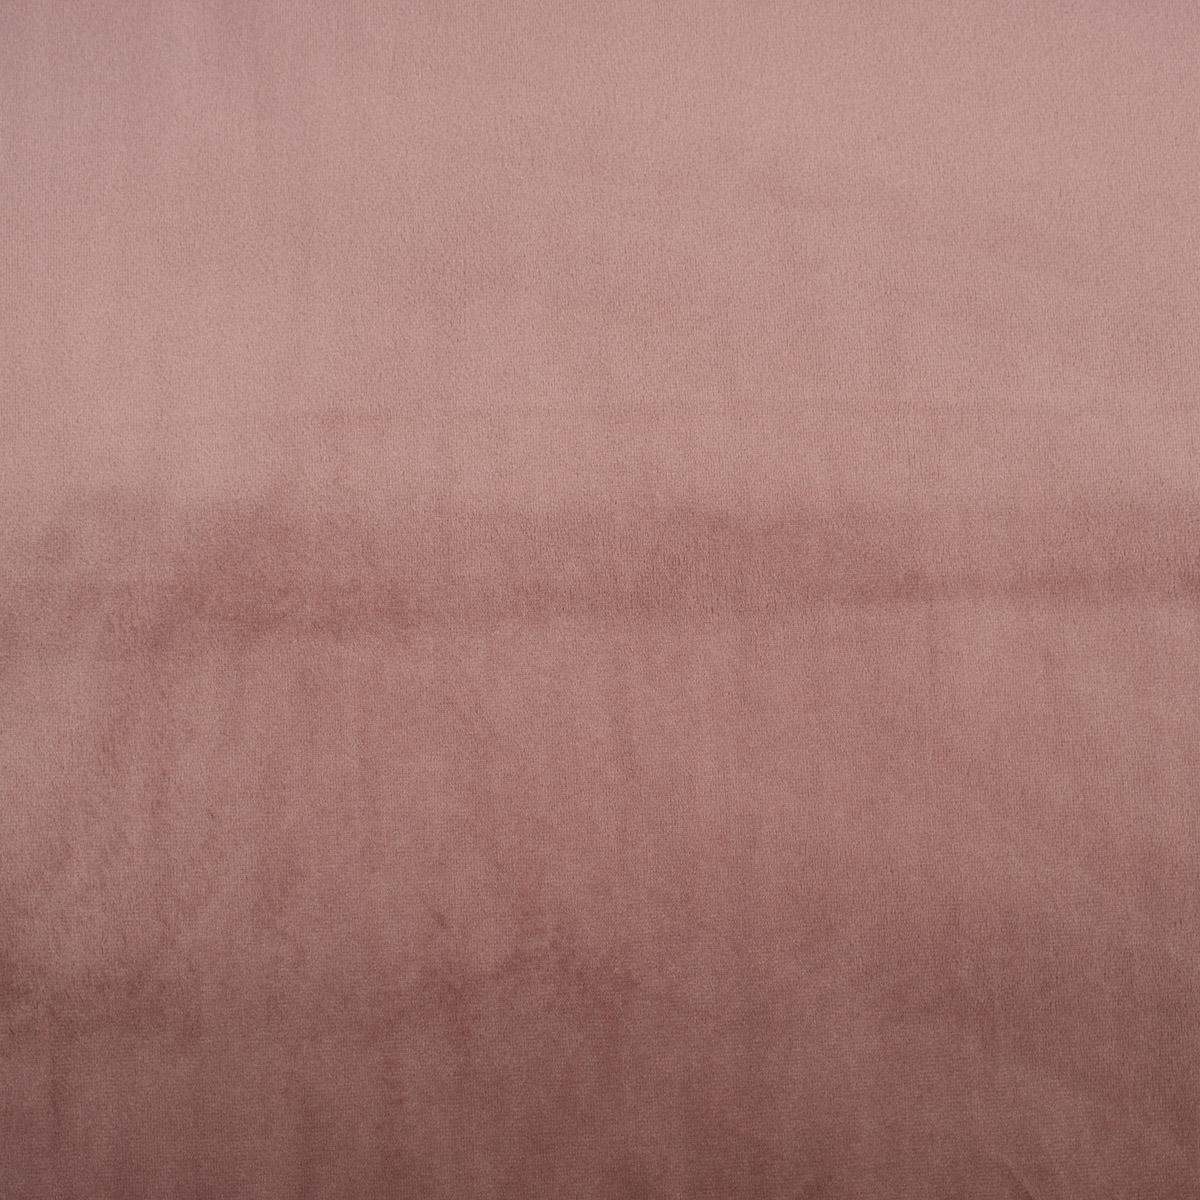 Samtstoff Dekostoff Velvet Samt einfarbig altrosa 1,4m